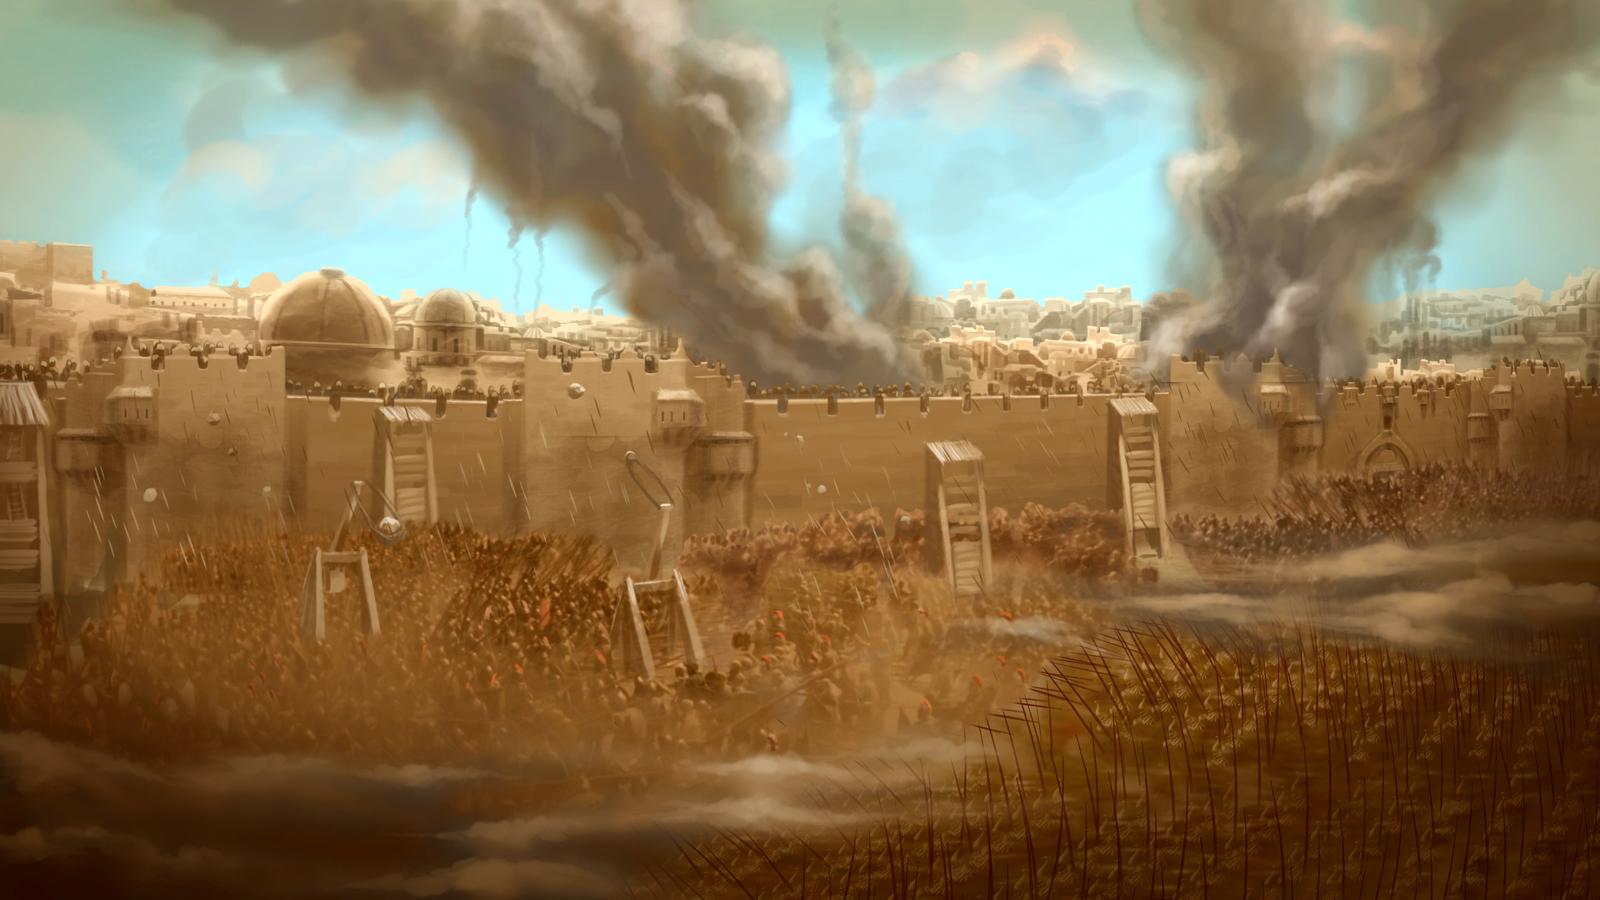 Blokade Yerusalem, Penyebab Awal Terjadinya Diaspora Yahudi